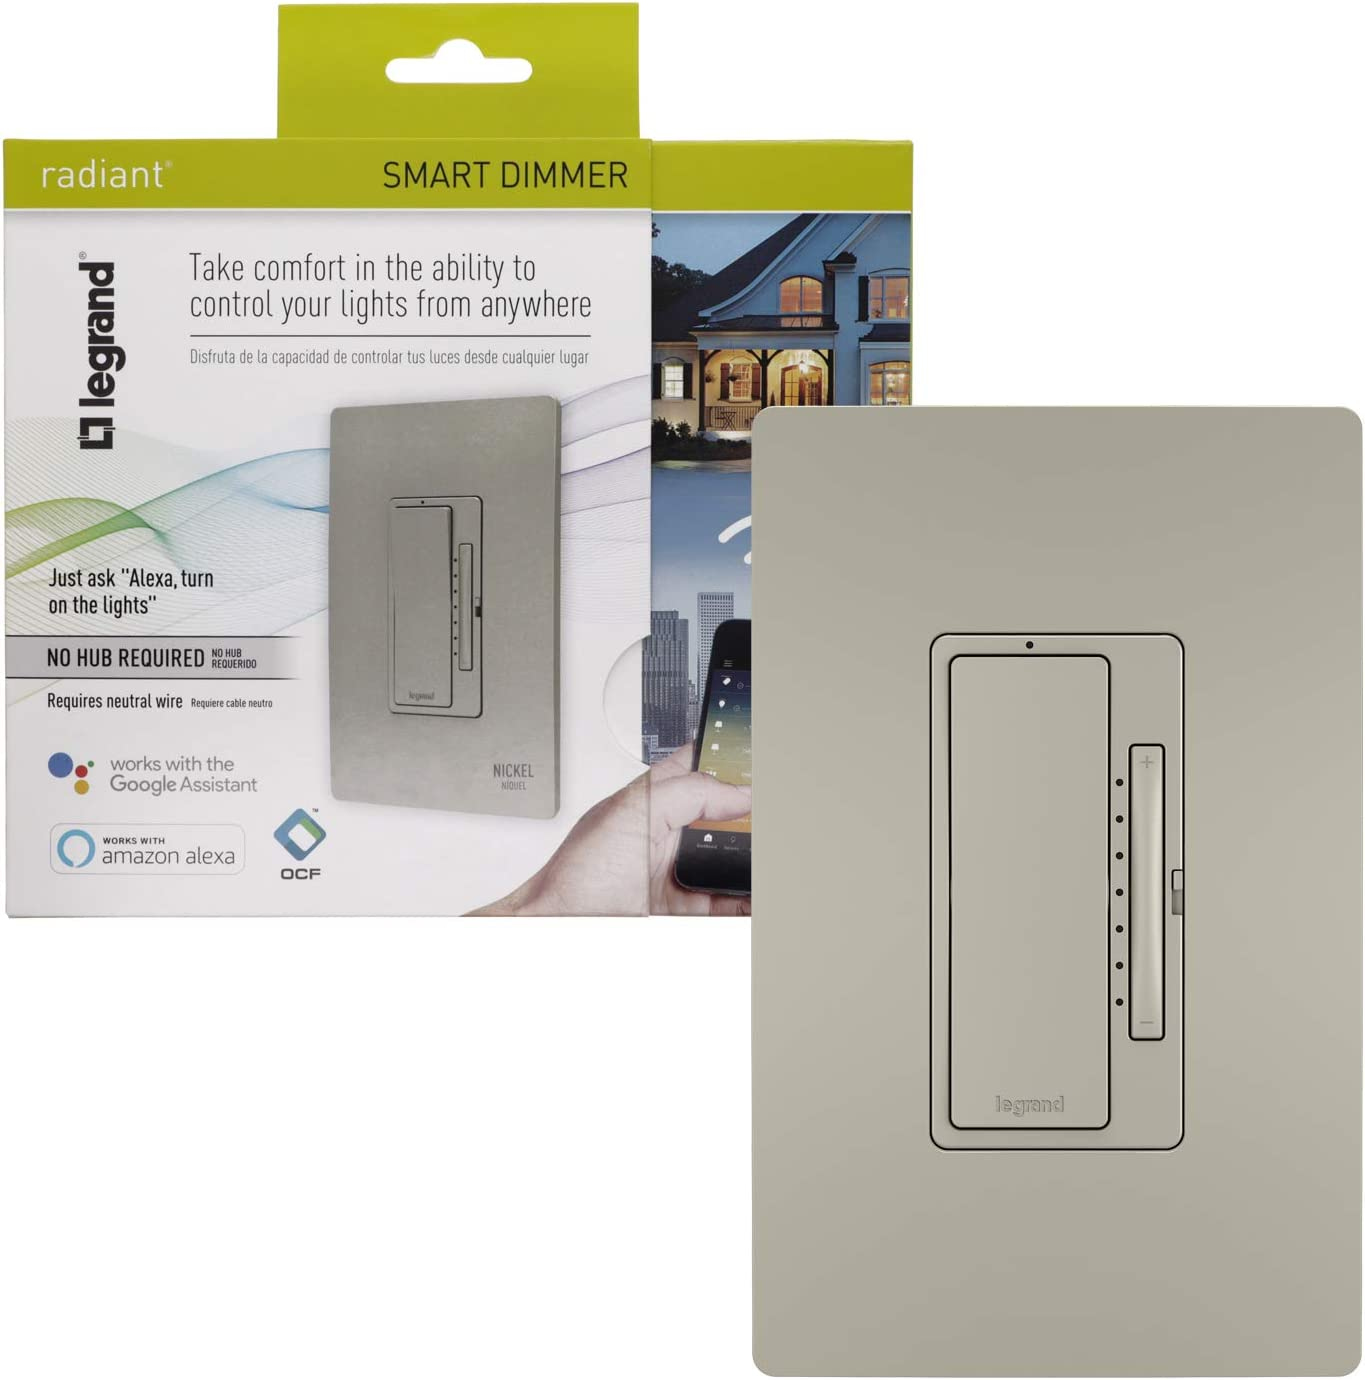 Legrand - Pass & Seymour Radiant WWRL50NICCV2 Tru-Universal Enabled Dimmer, Nickel Smart Wi-Fi Switch